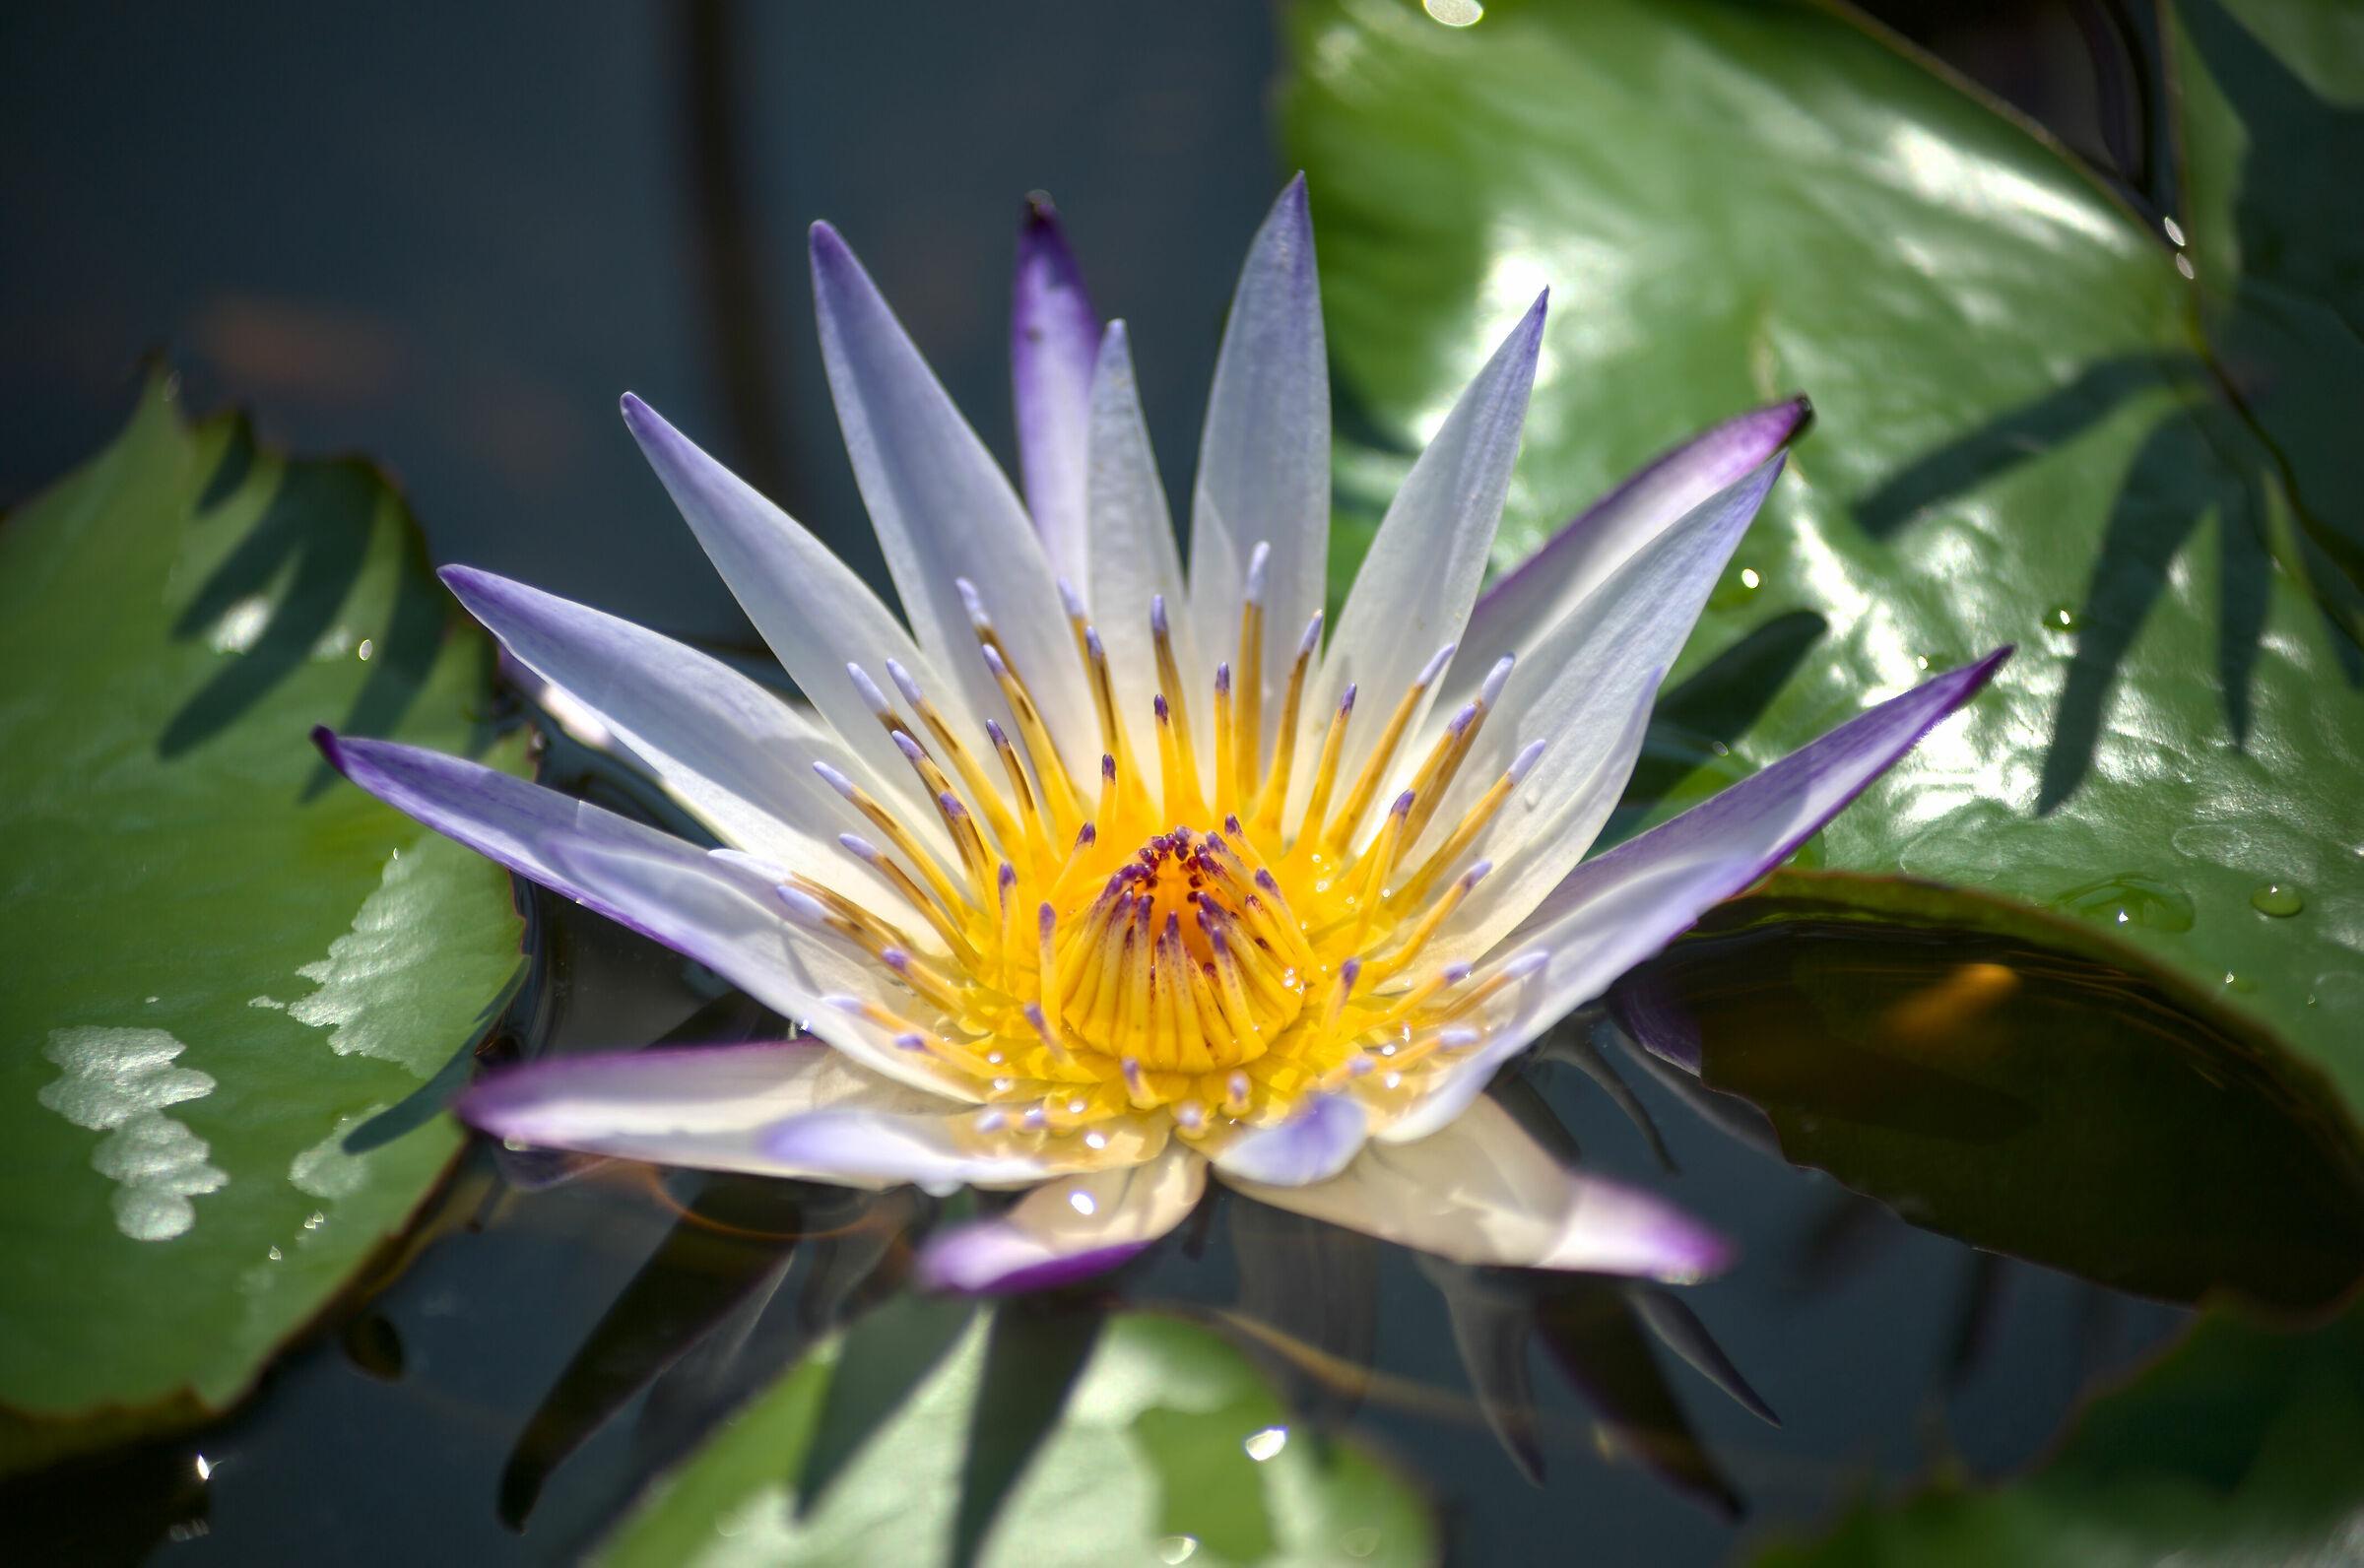 Star-studded loto...